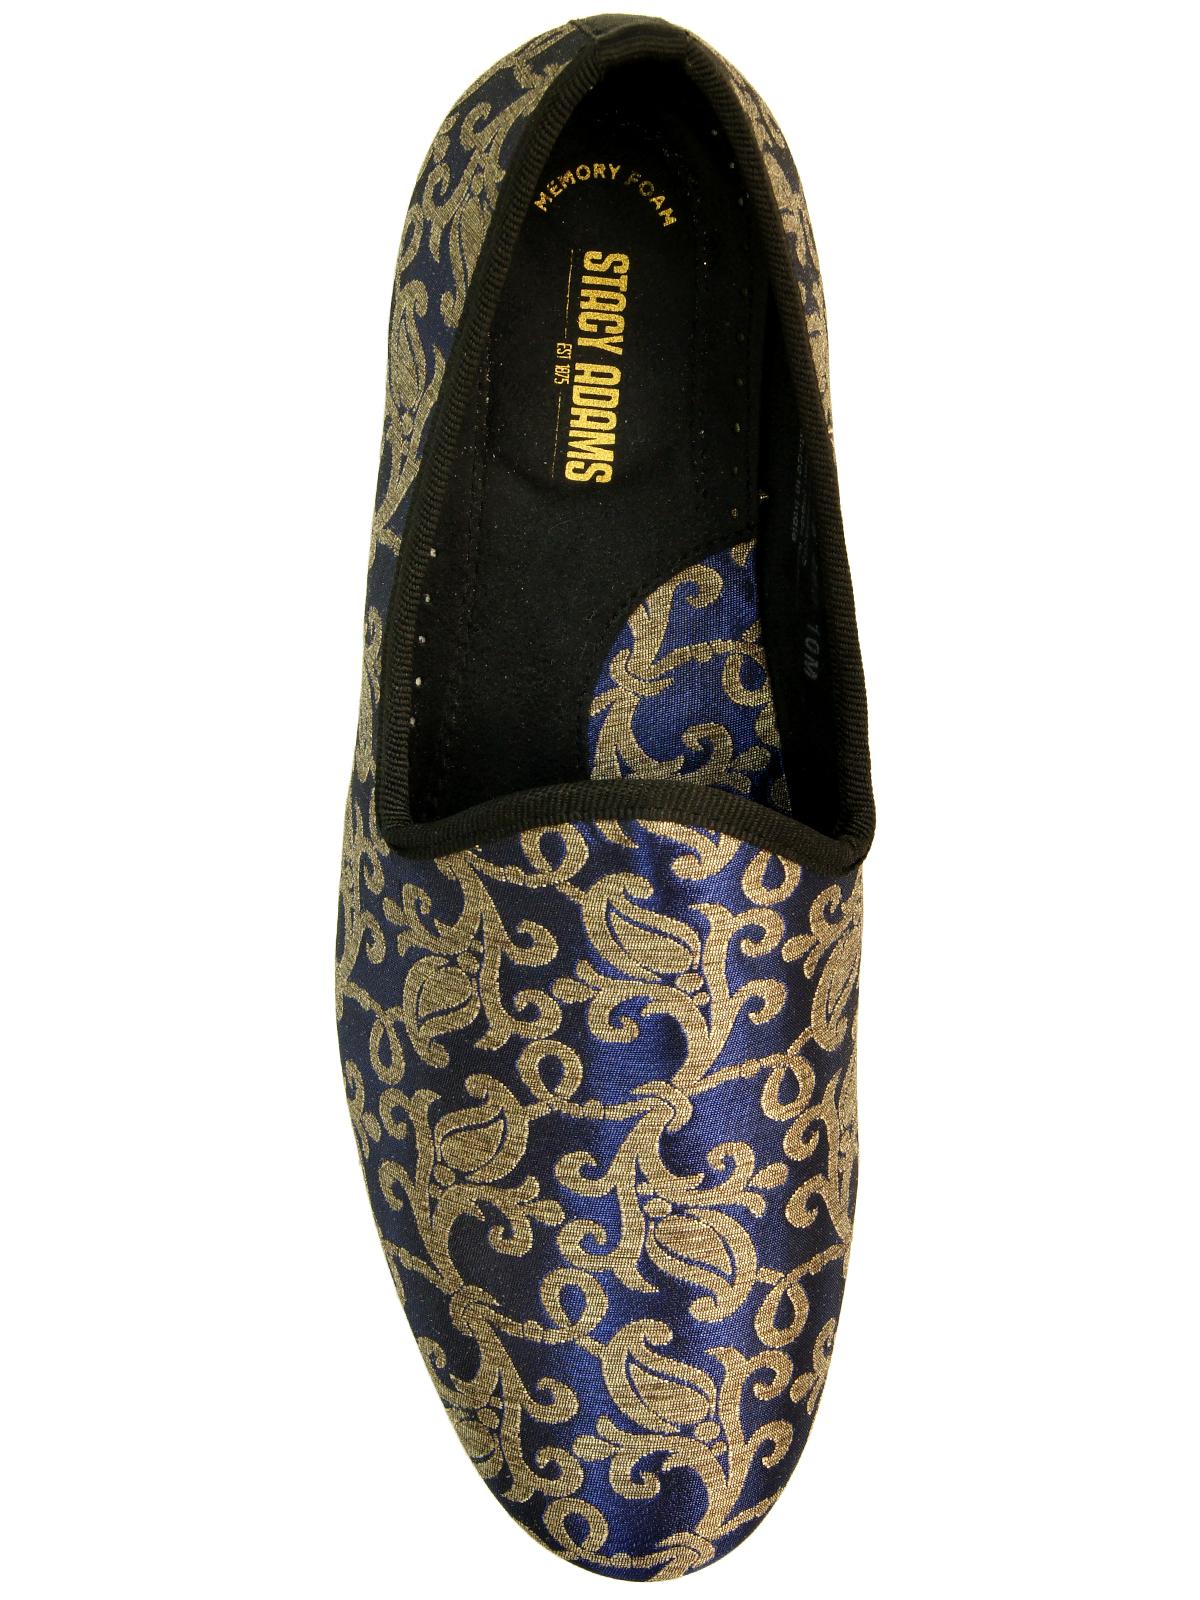 Stacy Adams Venice Navy Blue Gold Elegant Tapestry Pattern Slip On Loafer  Shoe 71ea5b1cc